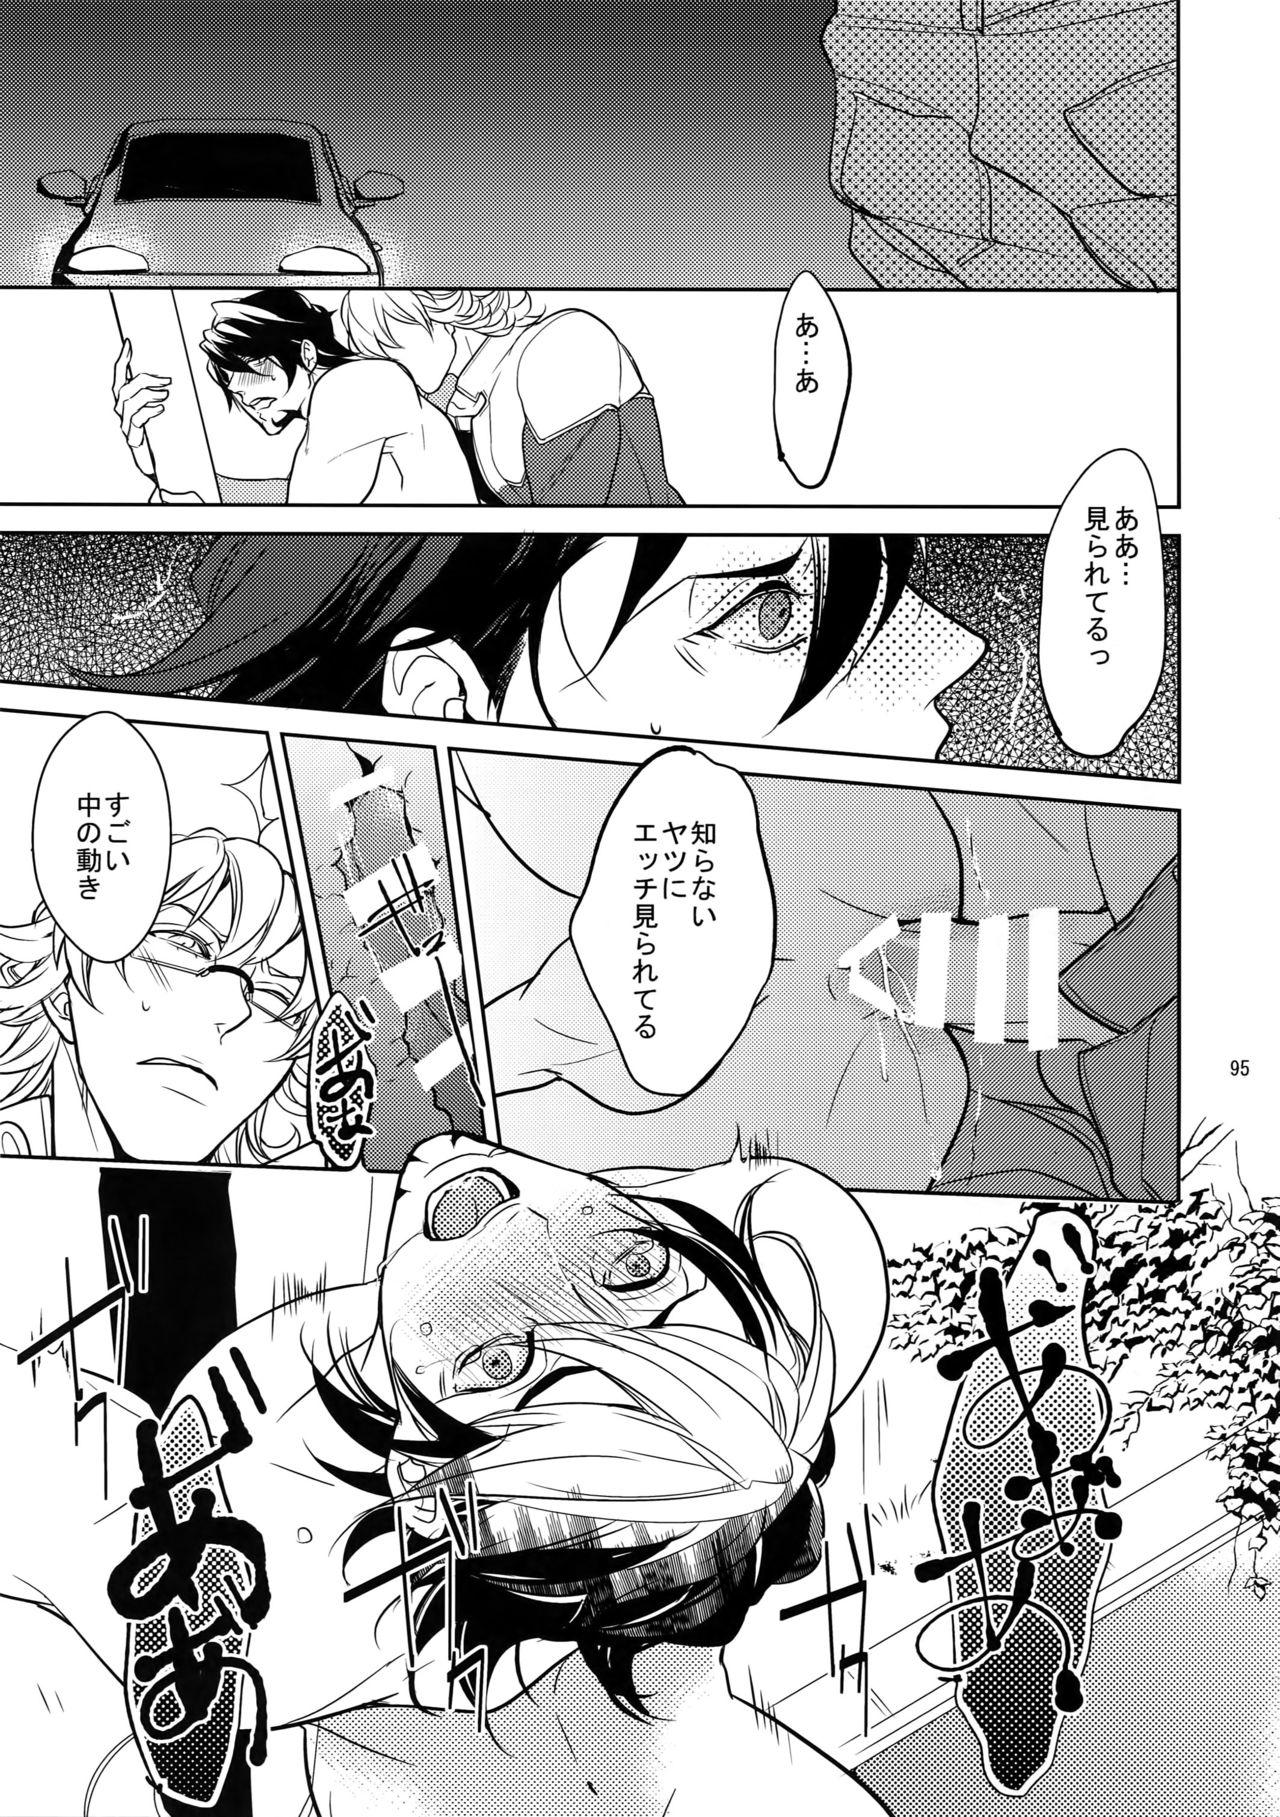 BOROZS Usagi Tora Sairoku 2 93